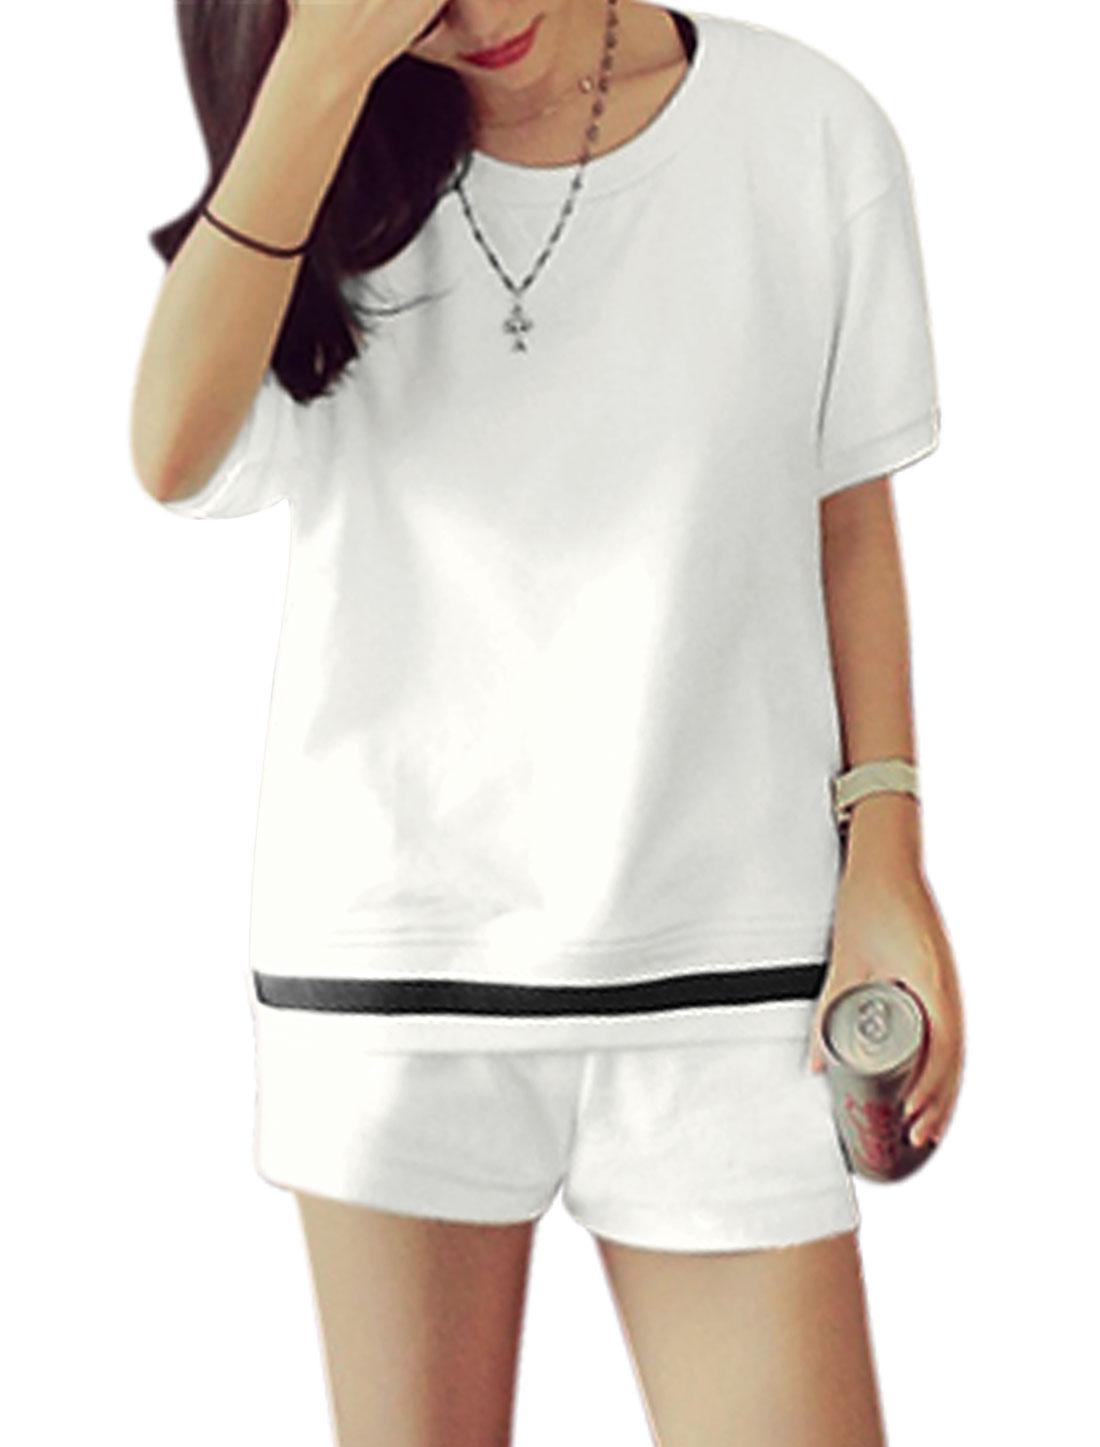 Ladies Short Sleeve Casual Top w Drawstring Waist Panel Shorts Sets White XS